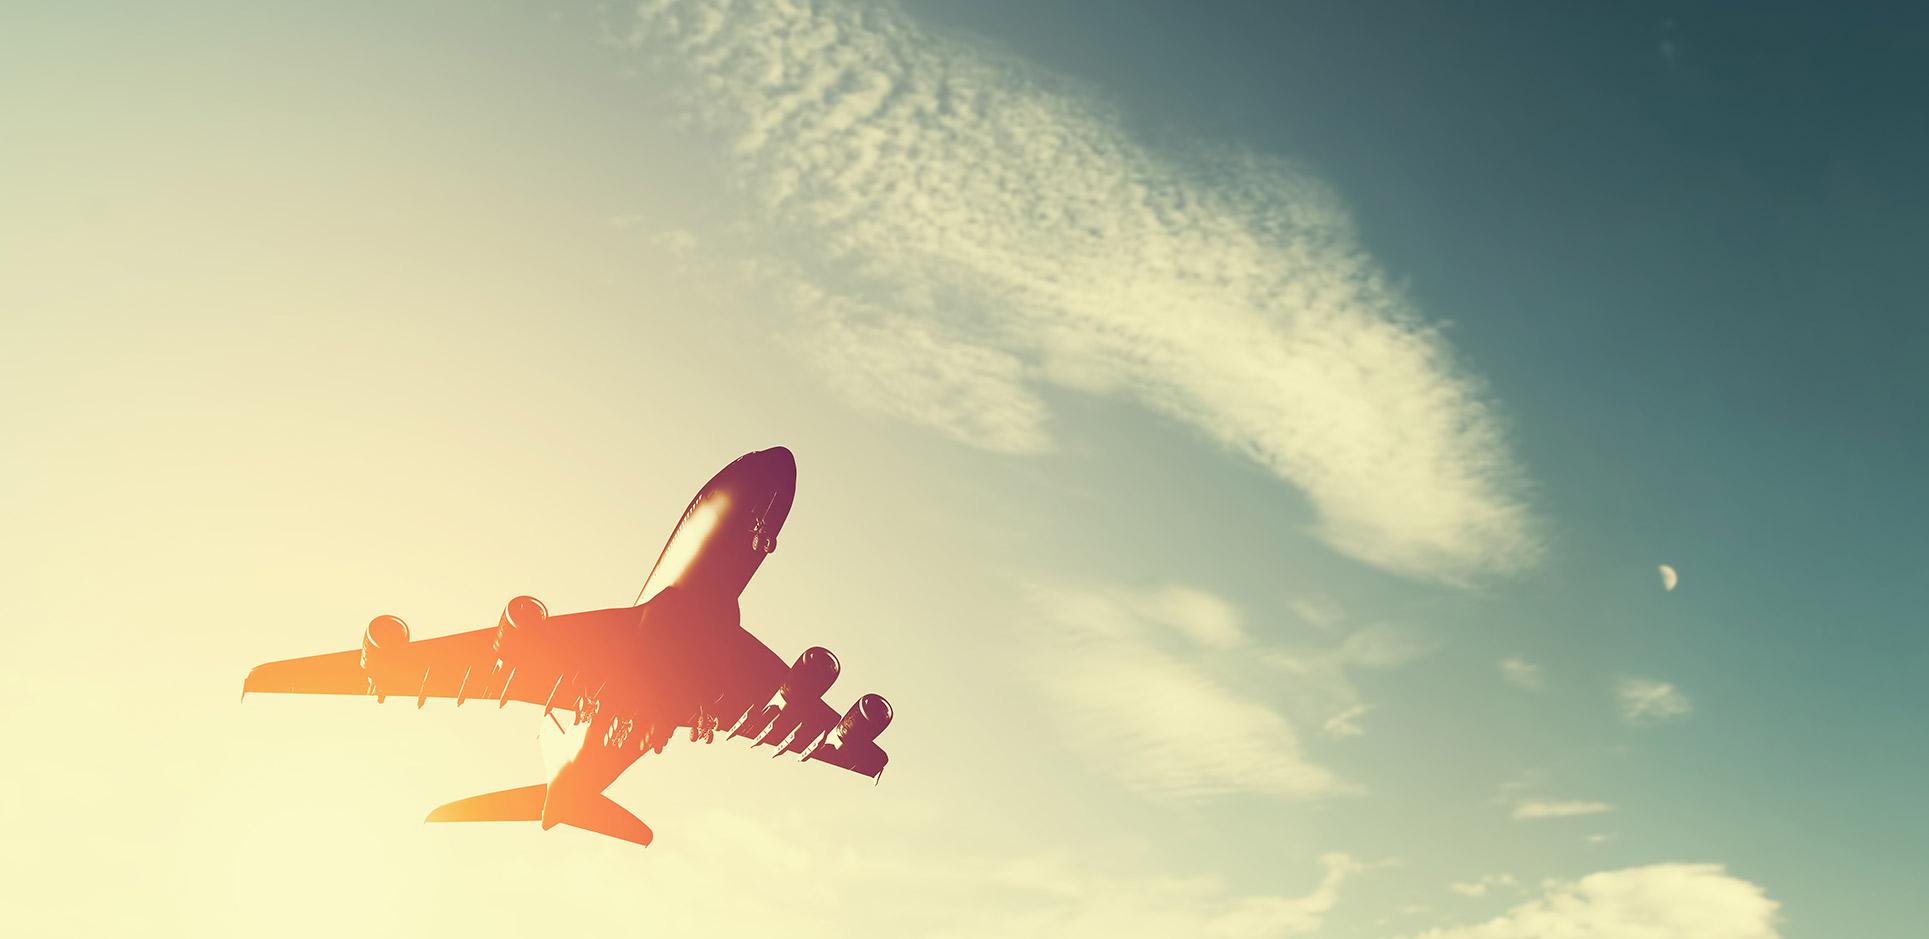 Air freight cargo plane